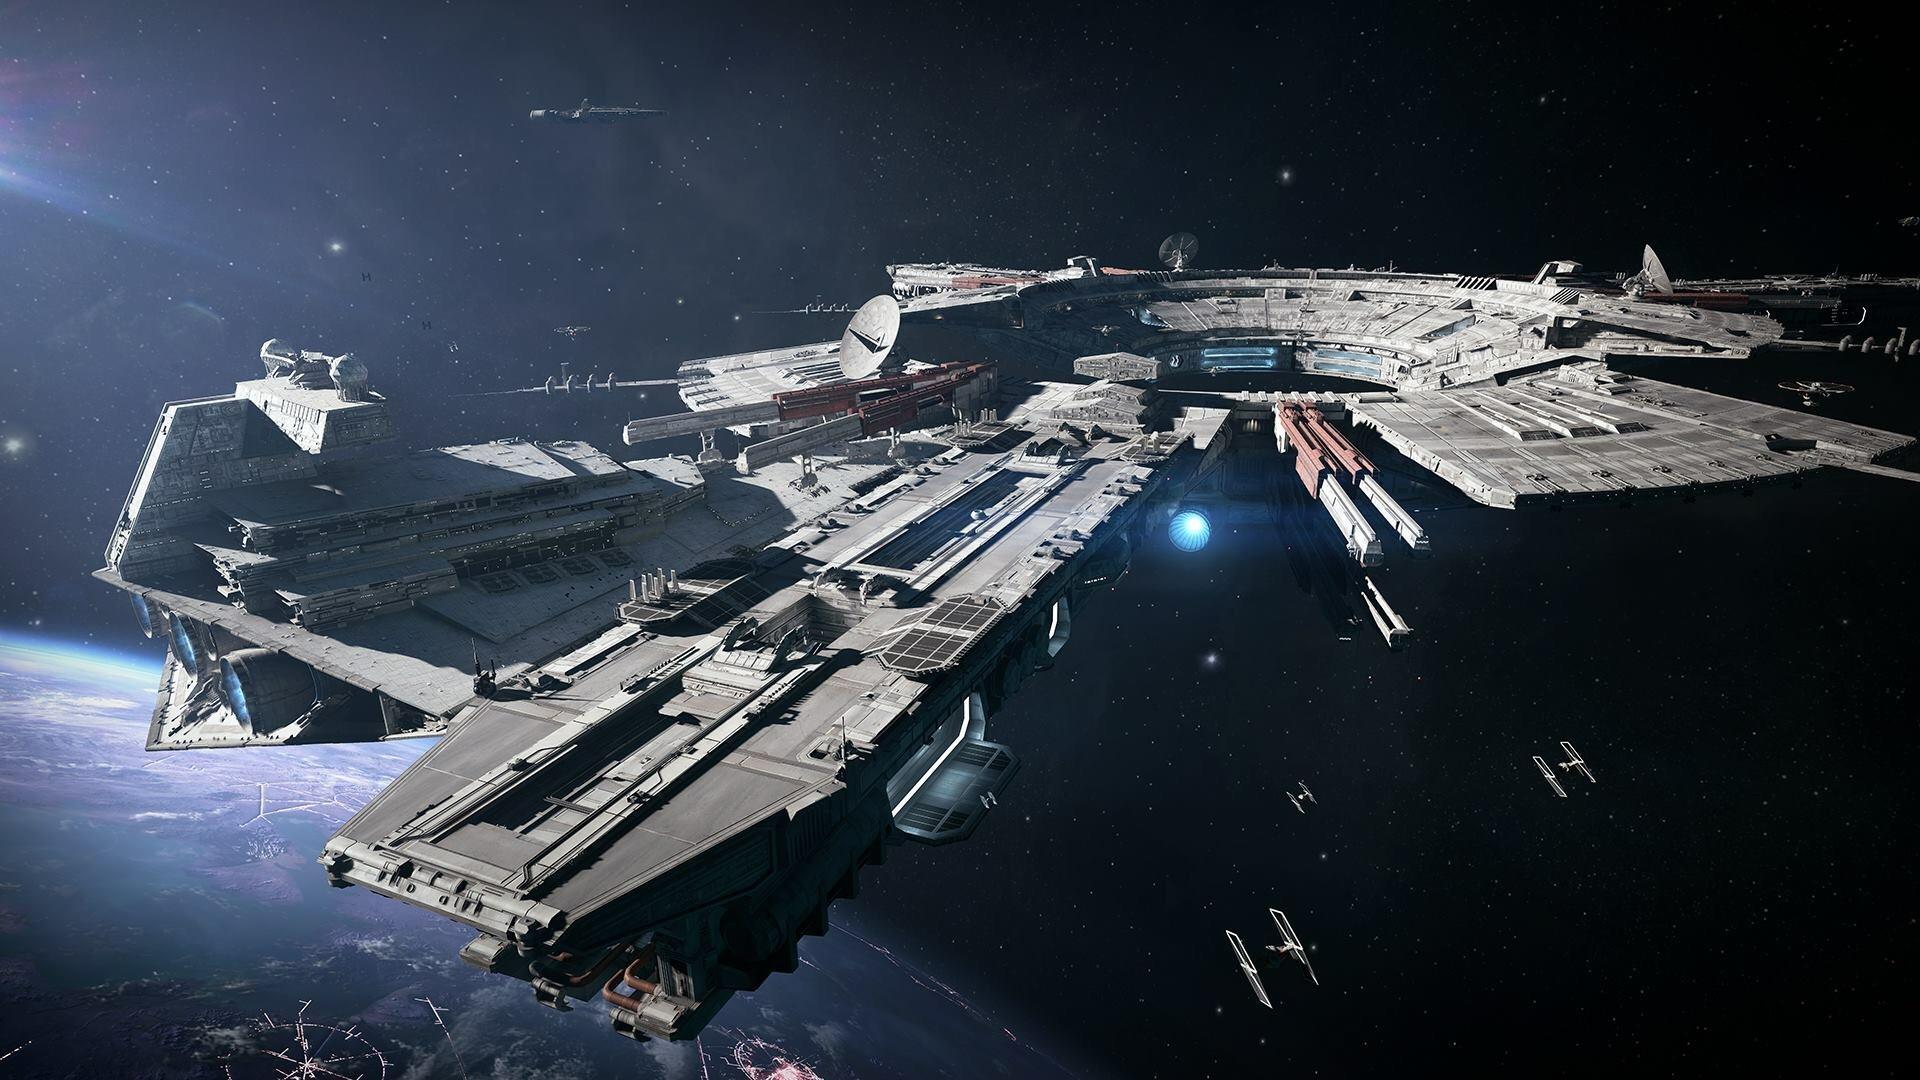 Fondor: Imperial Shipyard